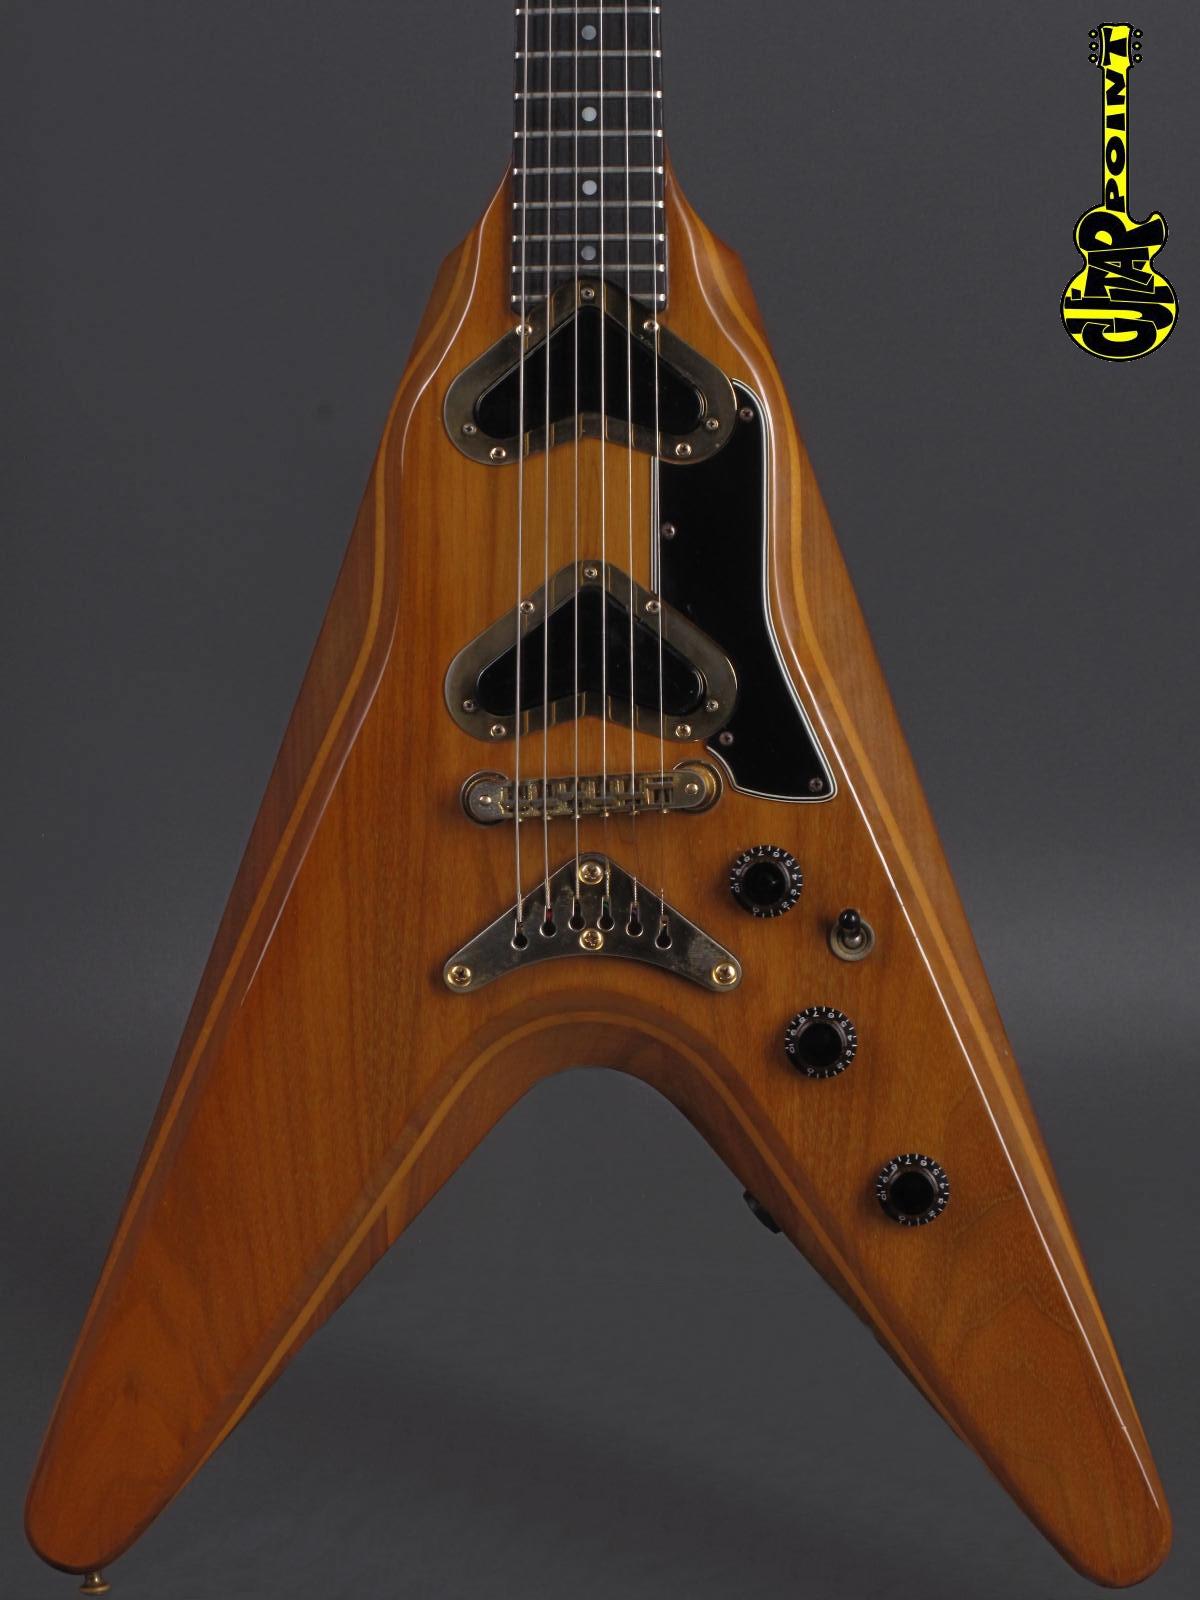 1980 Gibson Flying V2 - Natural